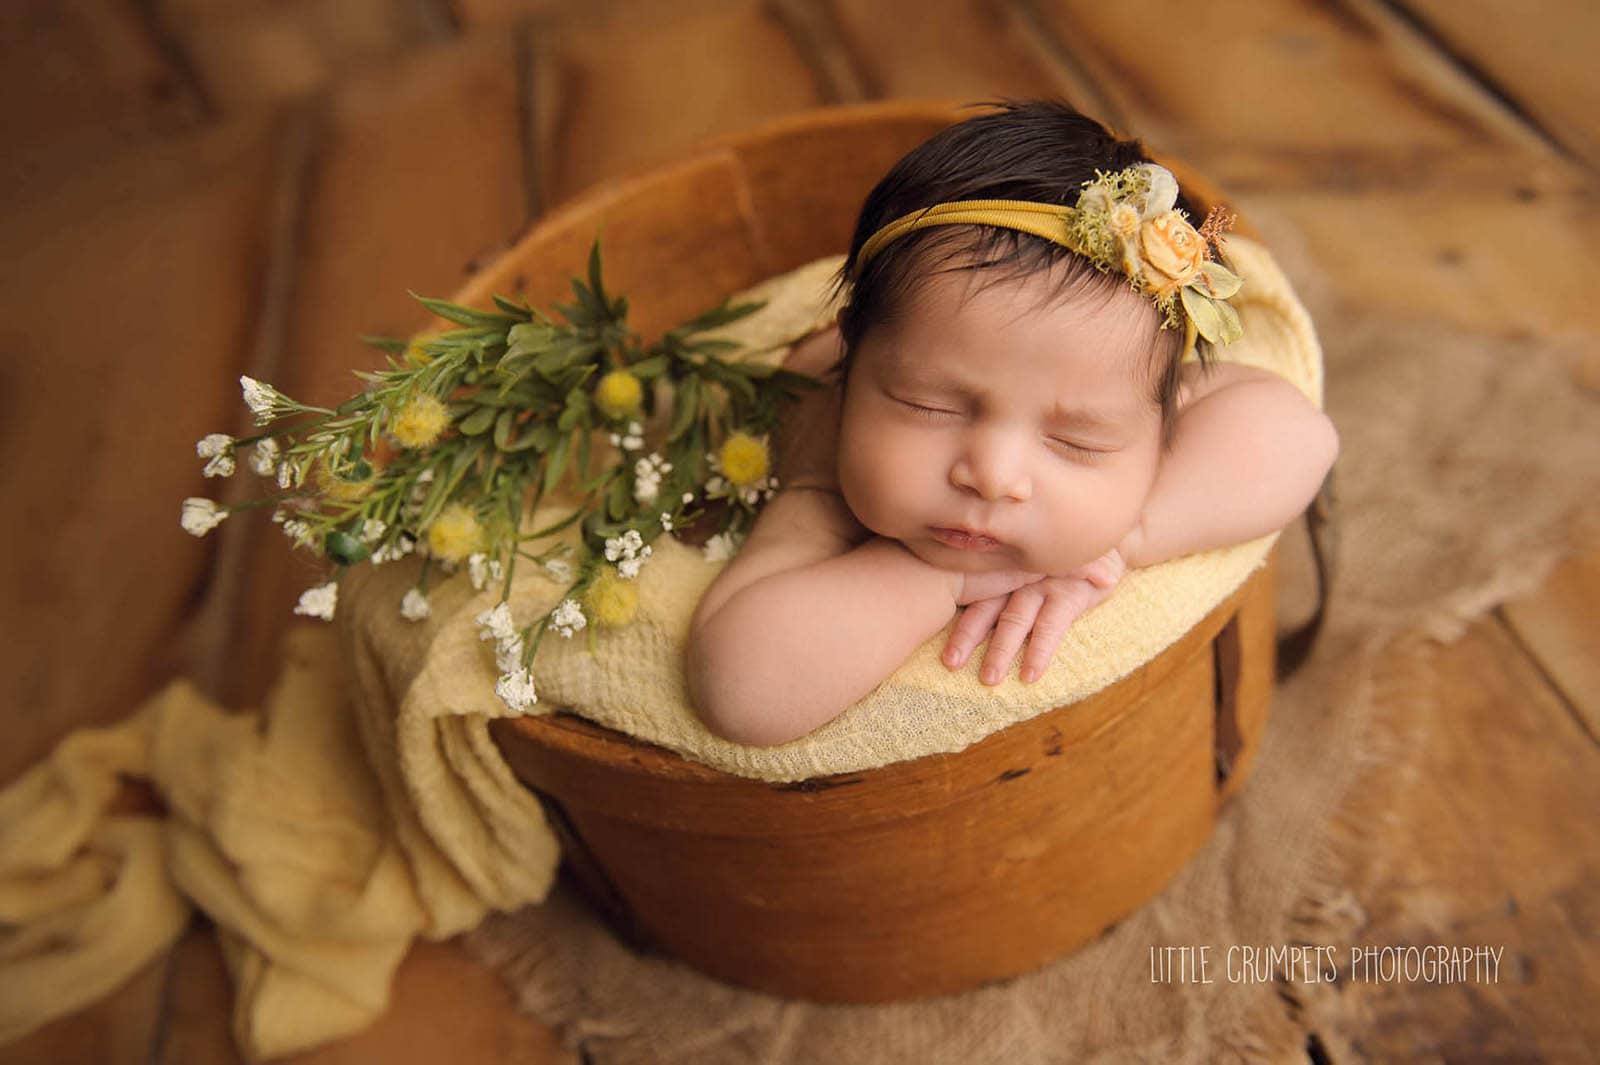 Trends in newborn photography